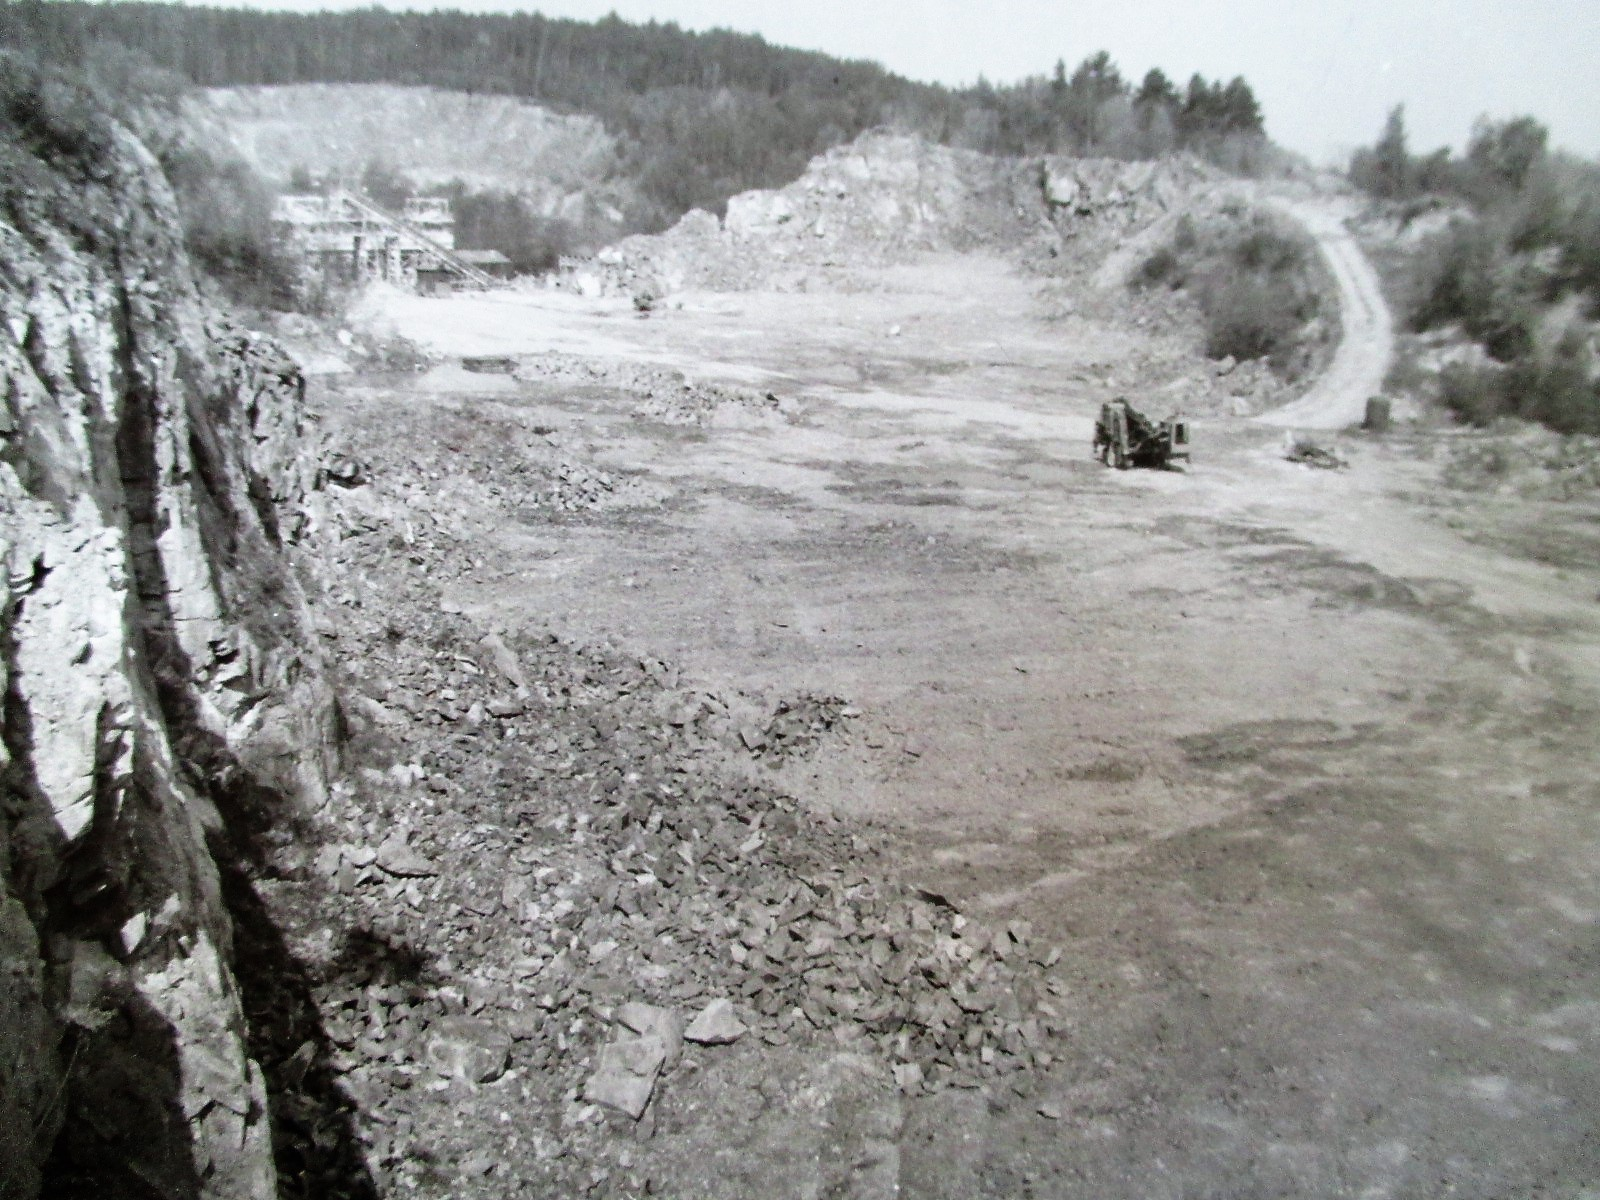 Kamenolom pohled 2